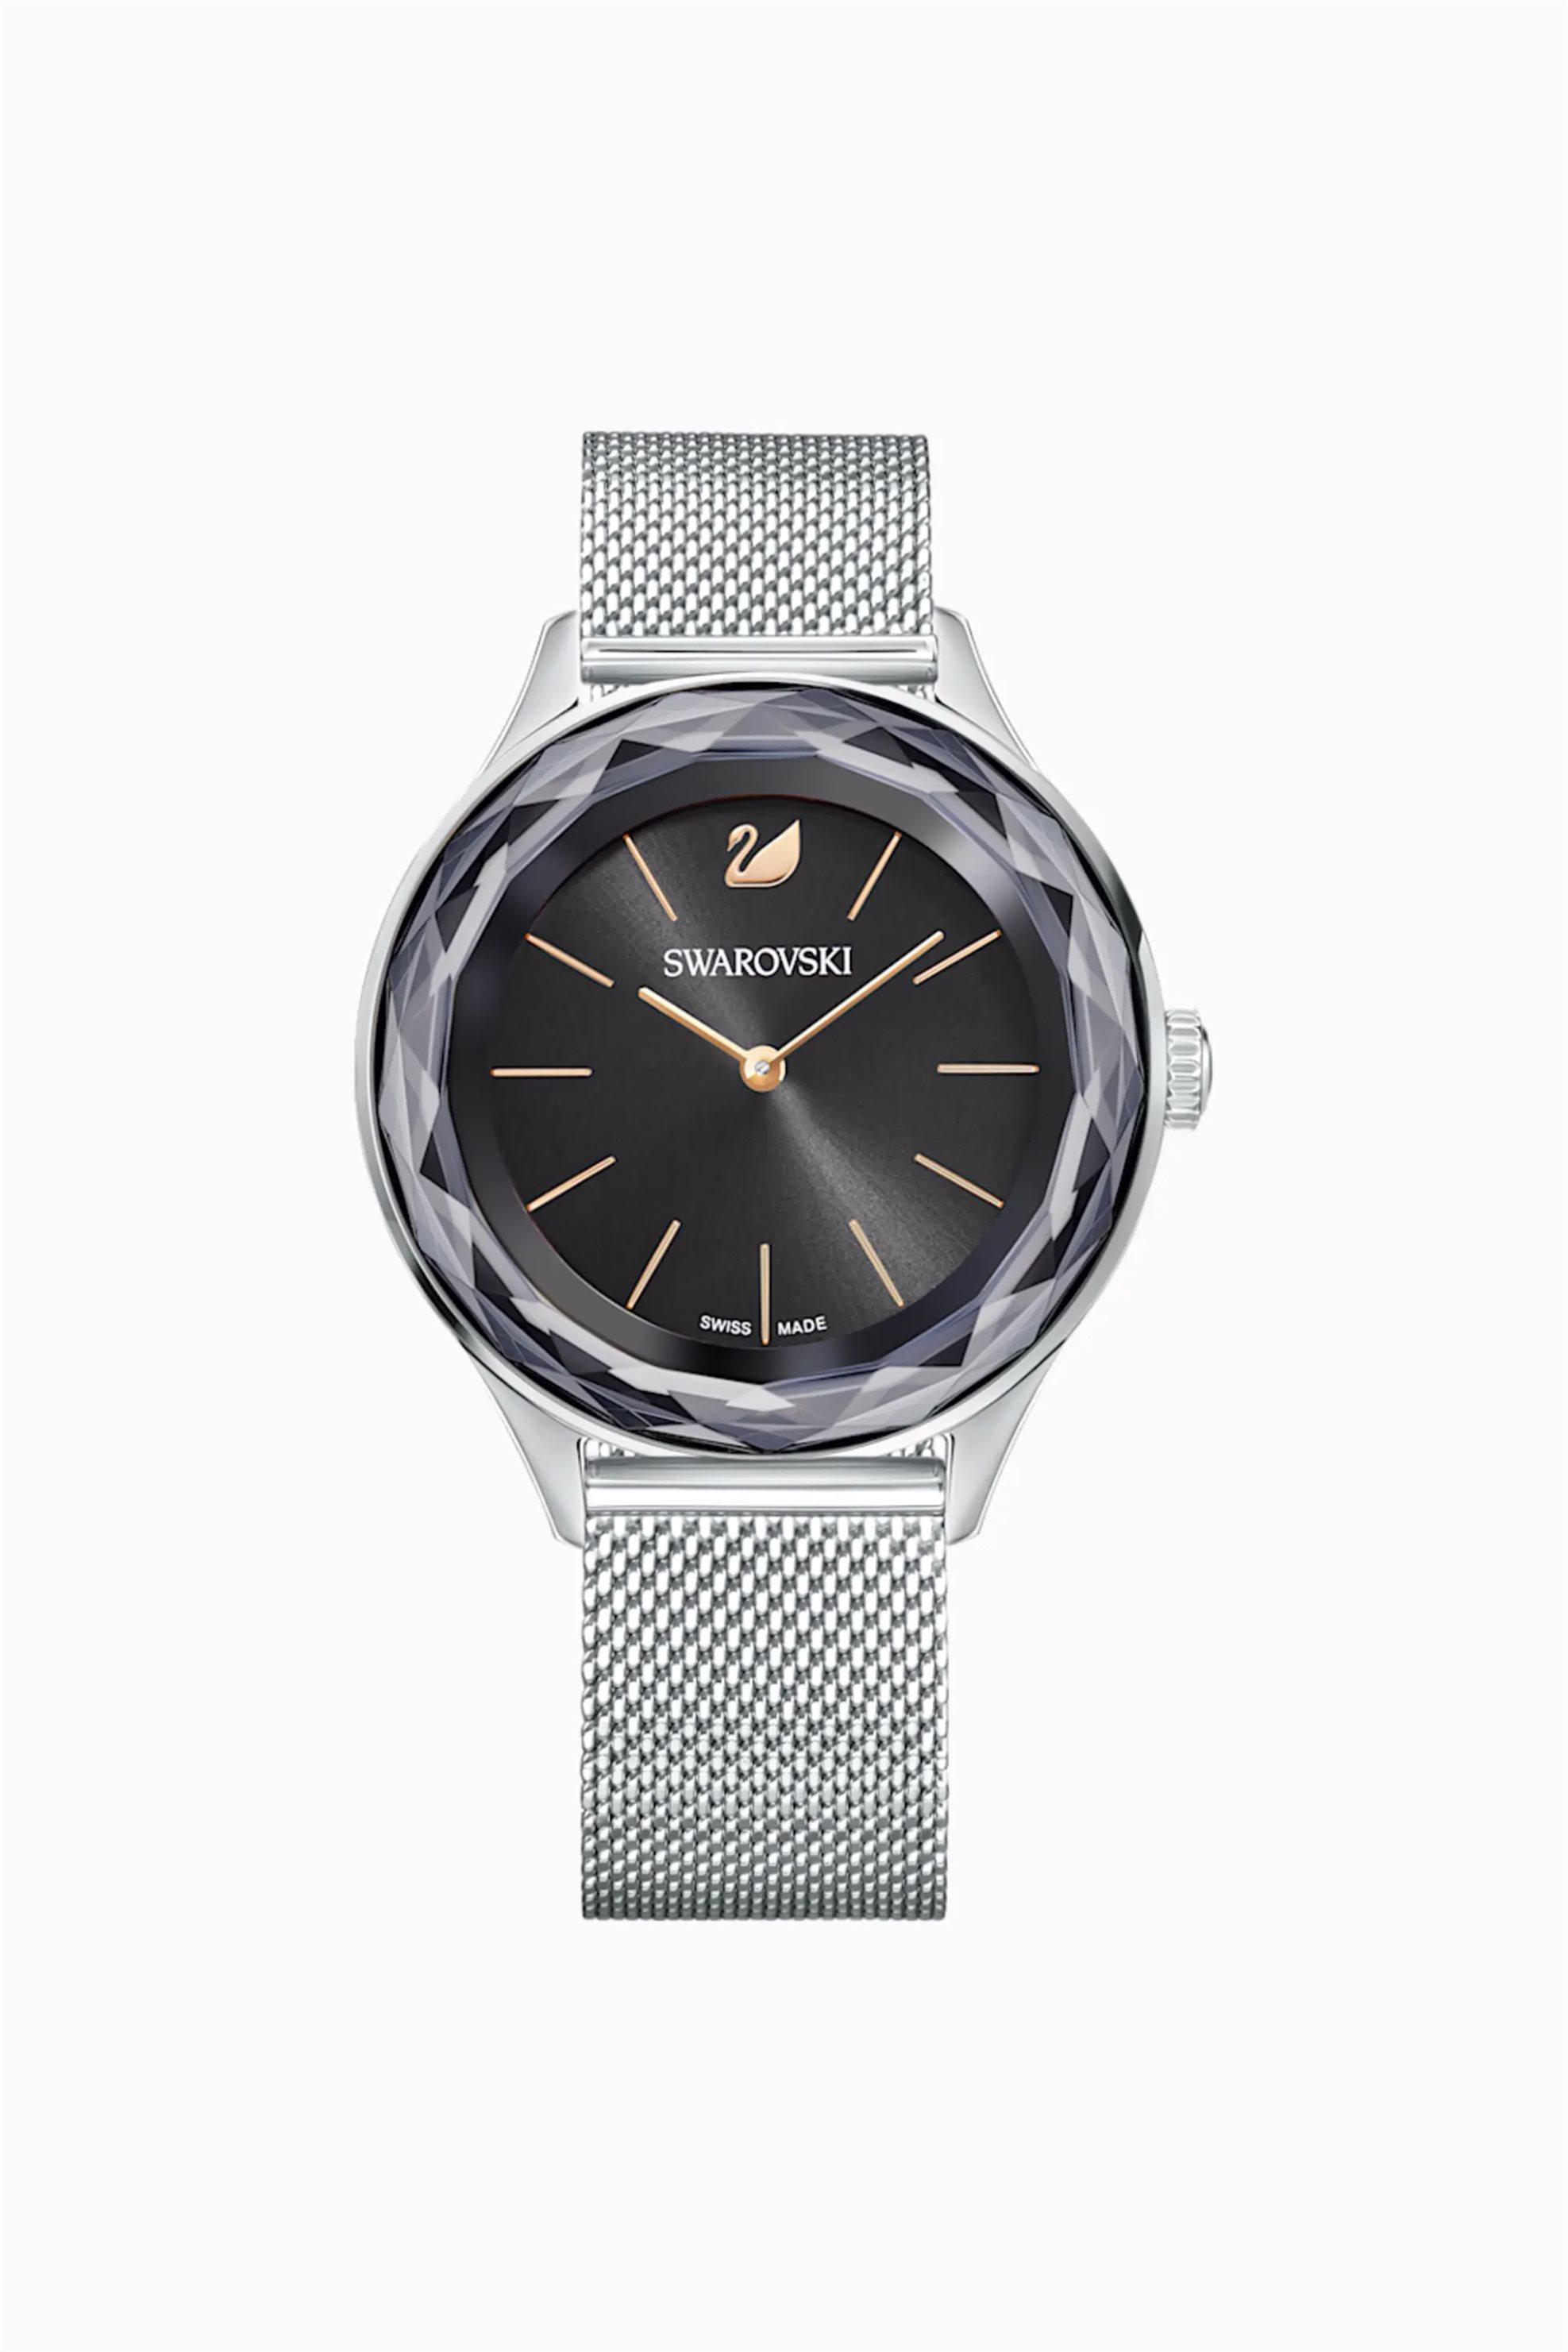 Swarovski Octea Nova Watch, Milanese bracelet, Black, Stainless steel - 5430420 - Μαύρο